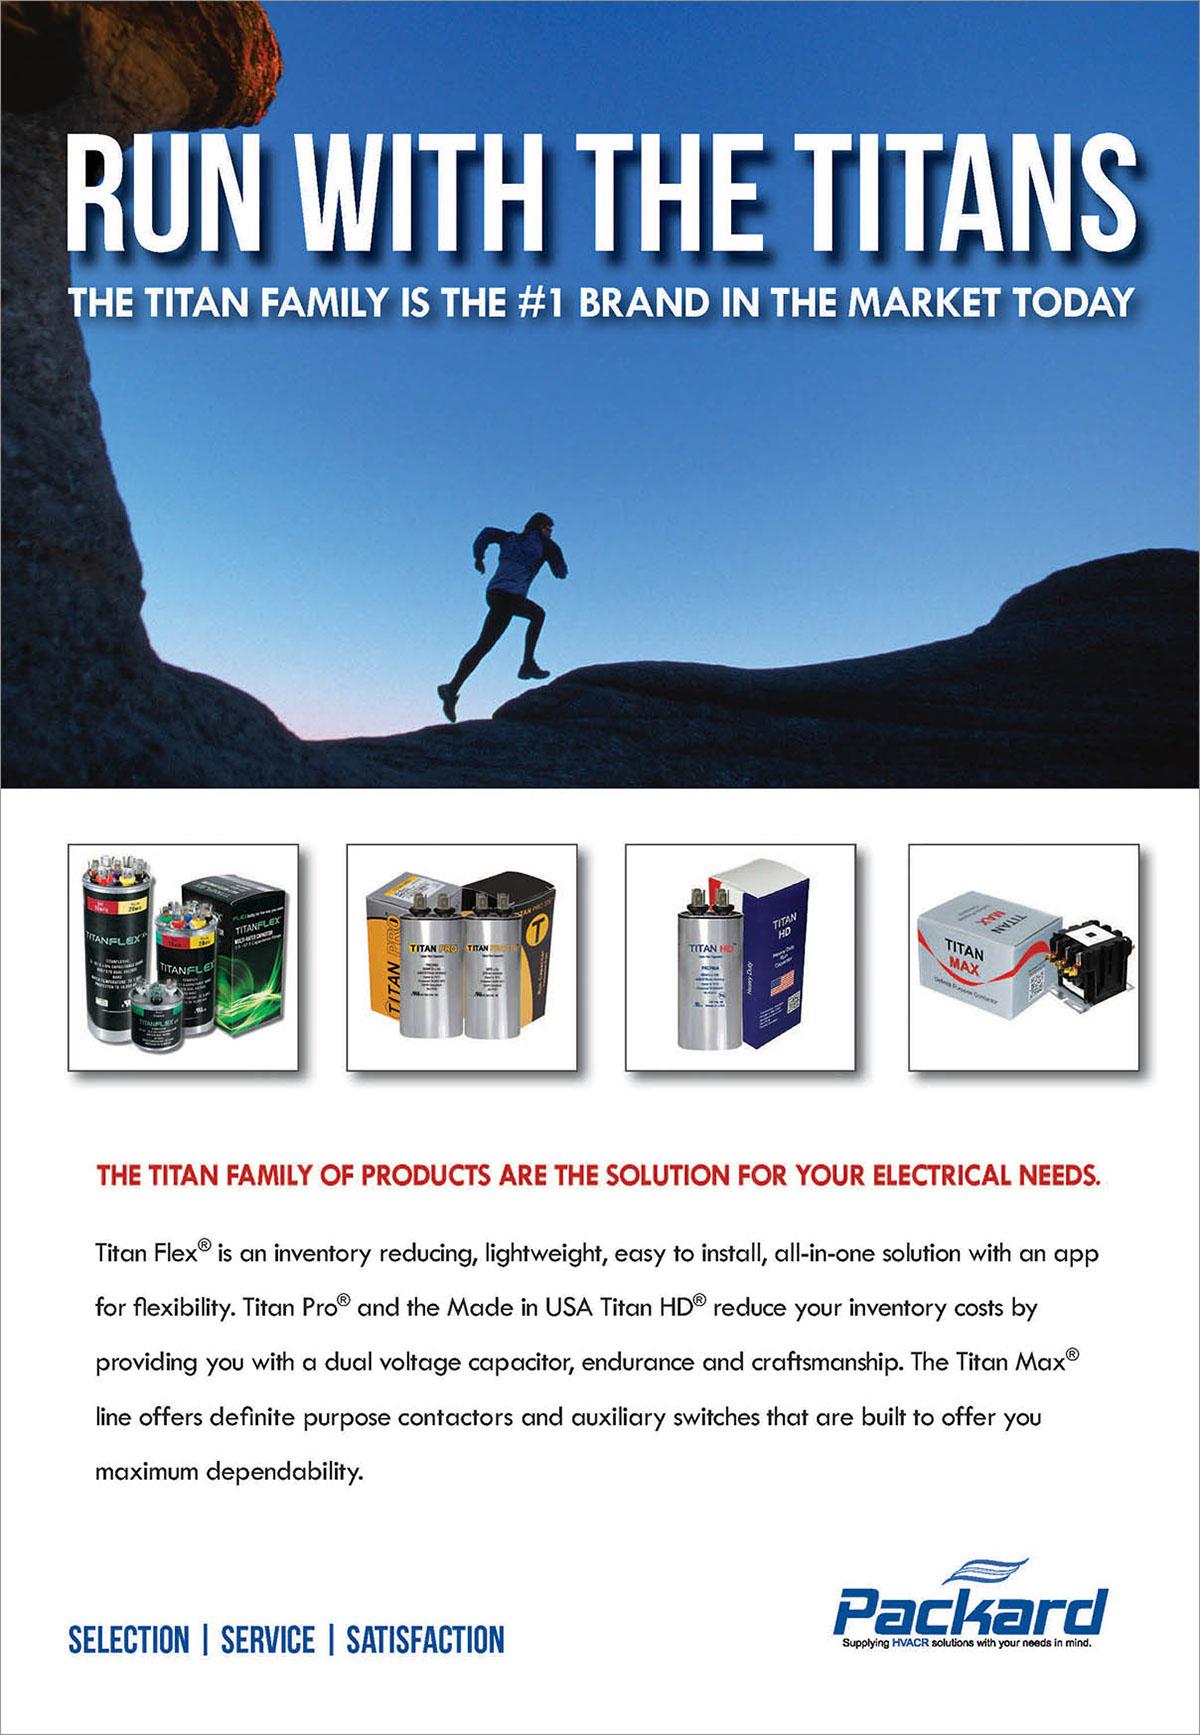 Packard Advertising, Branding, Packaging on Behance